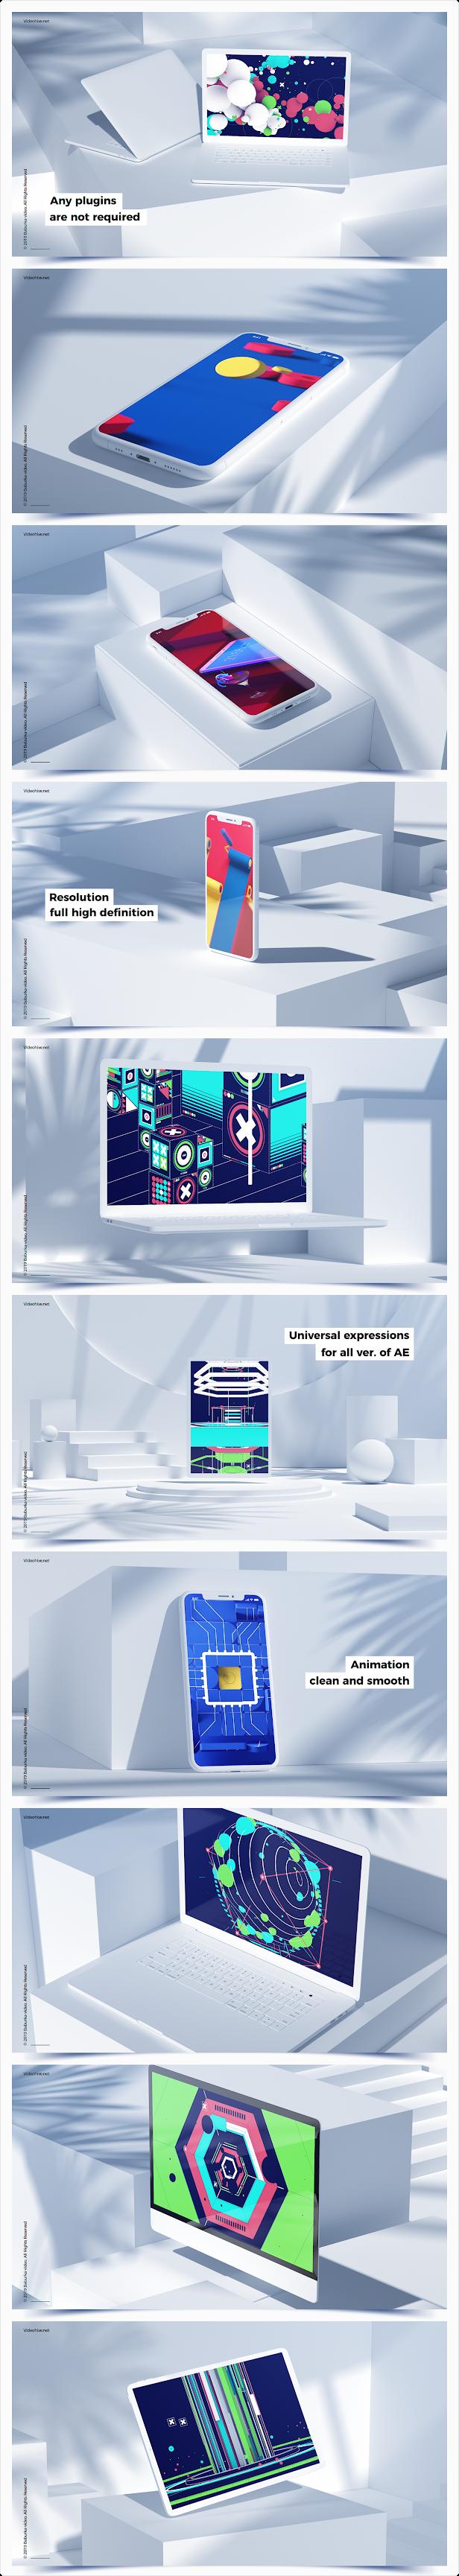 Devices Mockup // Geometric - 5